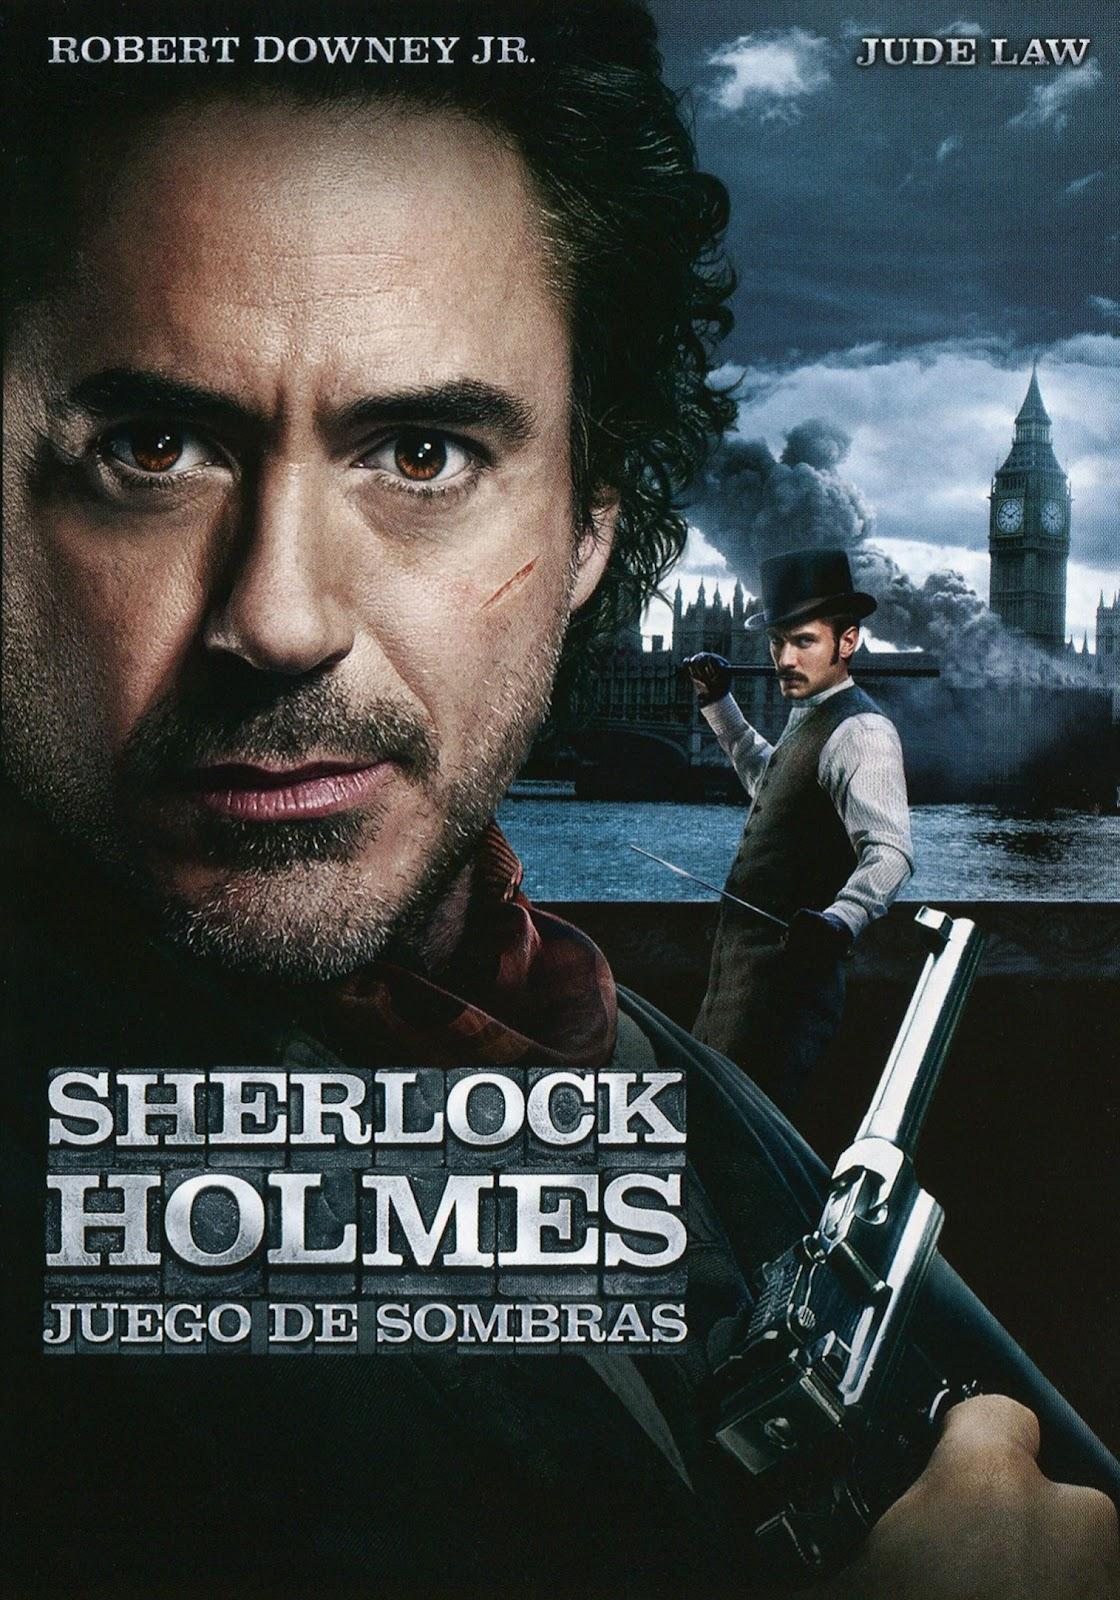 http://3.bp.blogspot.com/-N6msurv7p34/UAYG7LFuh_I/AAAAAAAAA5k/eKw-b4e__jc/s1600/Sherlock_Holmes_-_Juego_De_Sombras_por_manmerino_%5Bdvd%5D_80.jpg